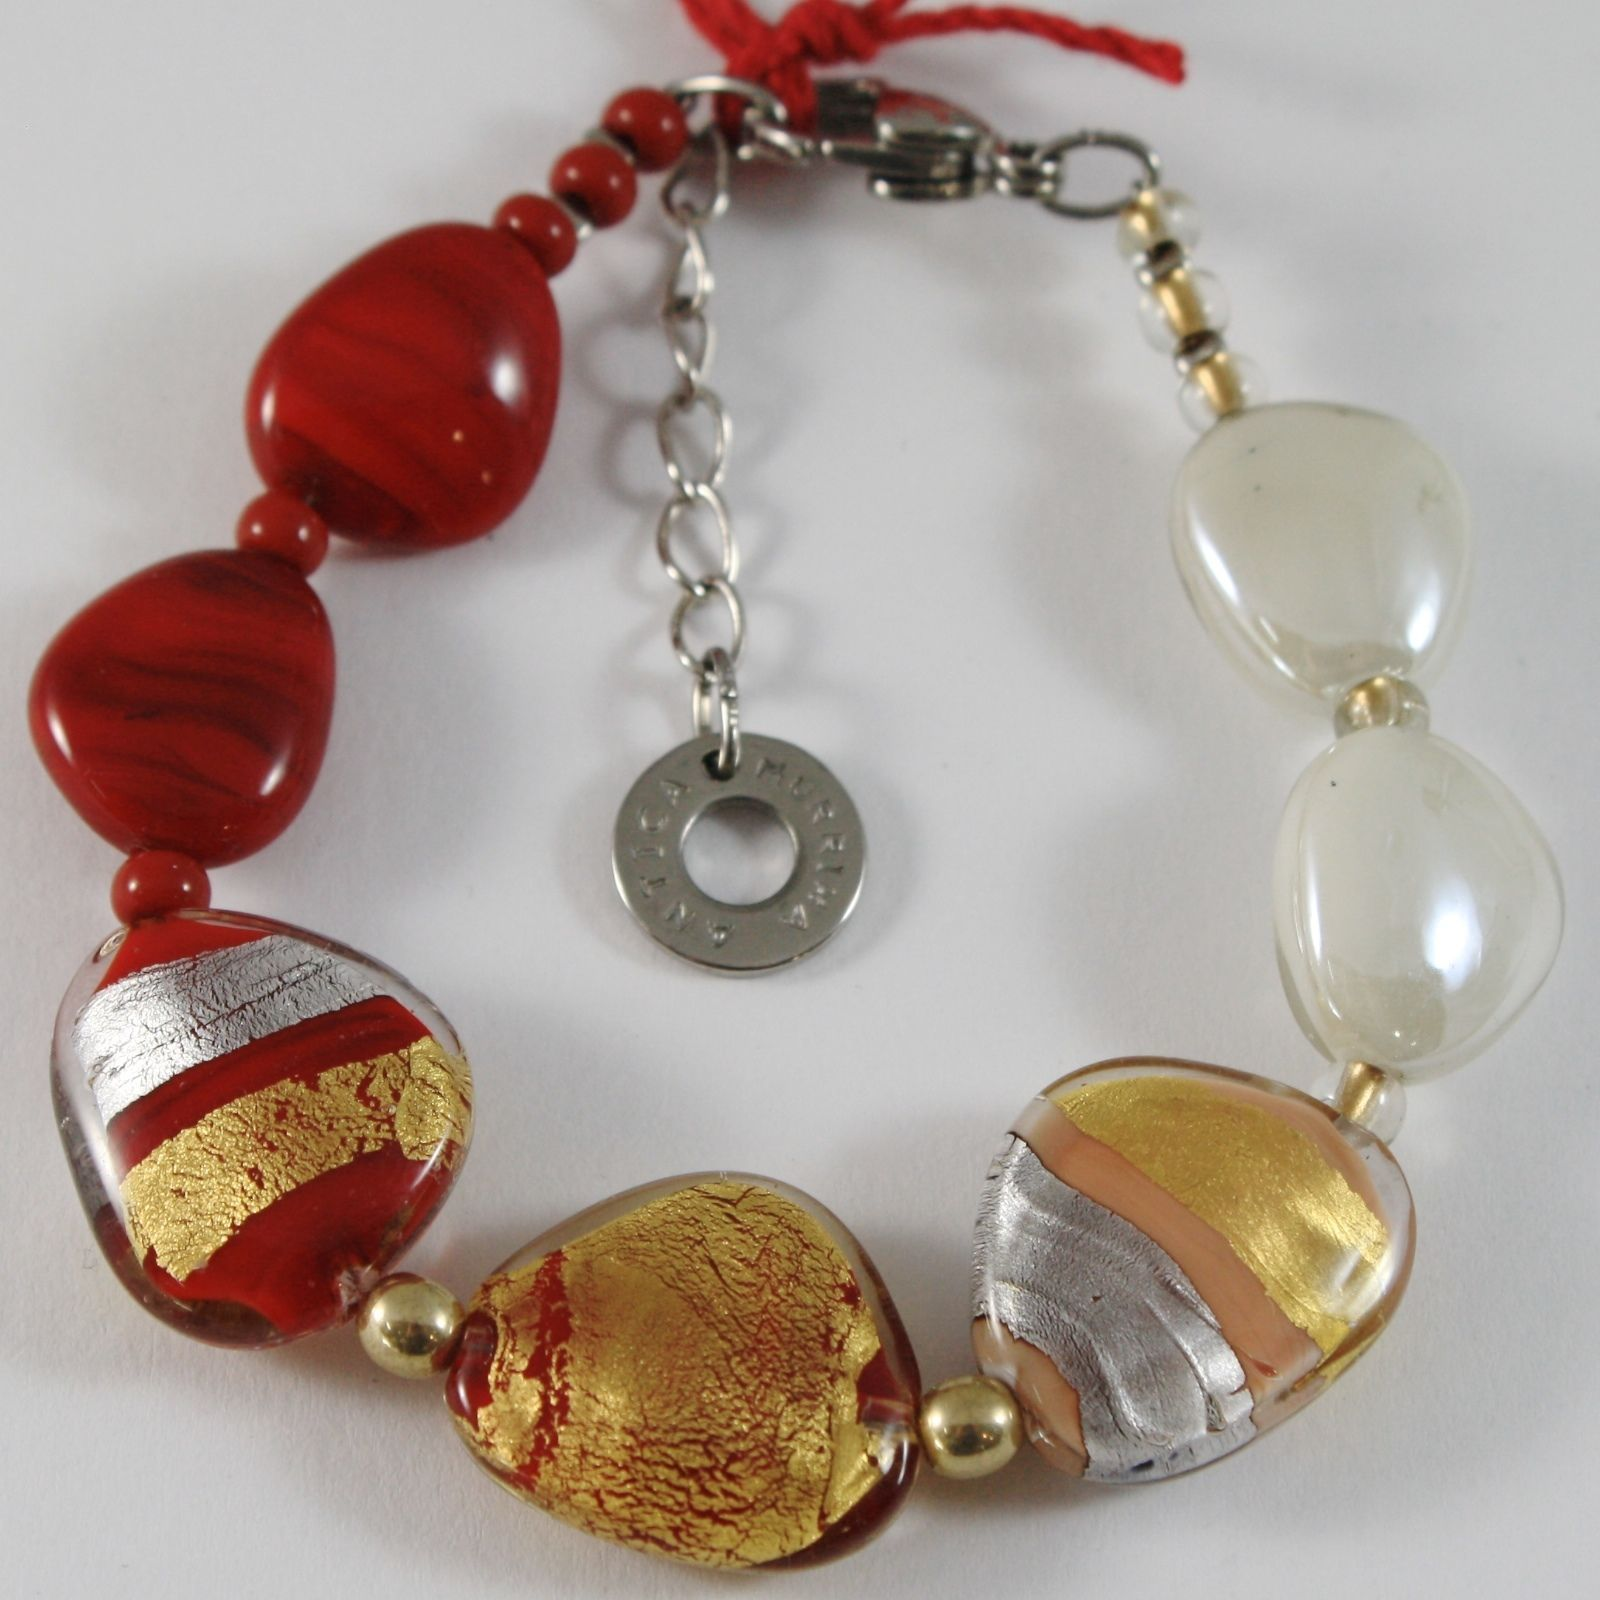 BRACELET ANTICA MURRINA VENEZIA WITH MURANO GLASS RED AND BEIGE BR747A11